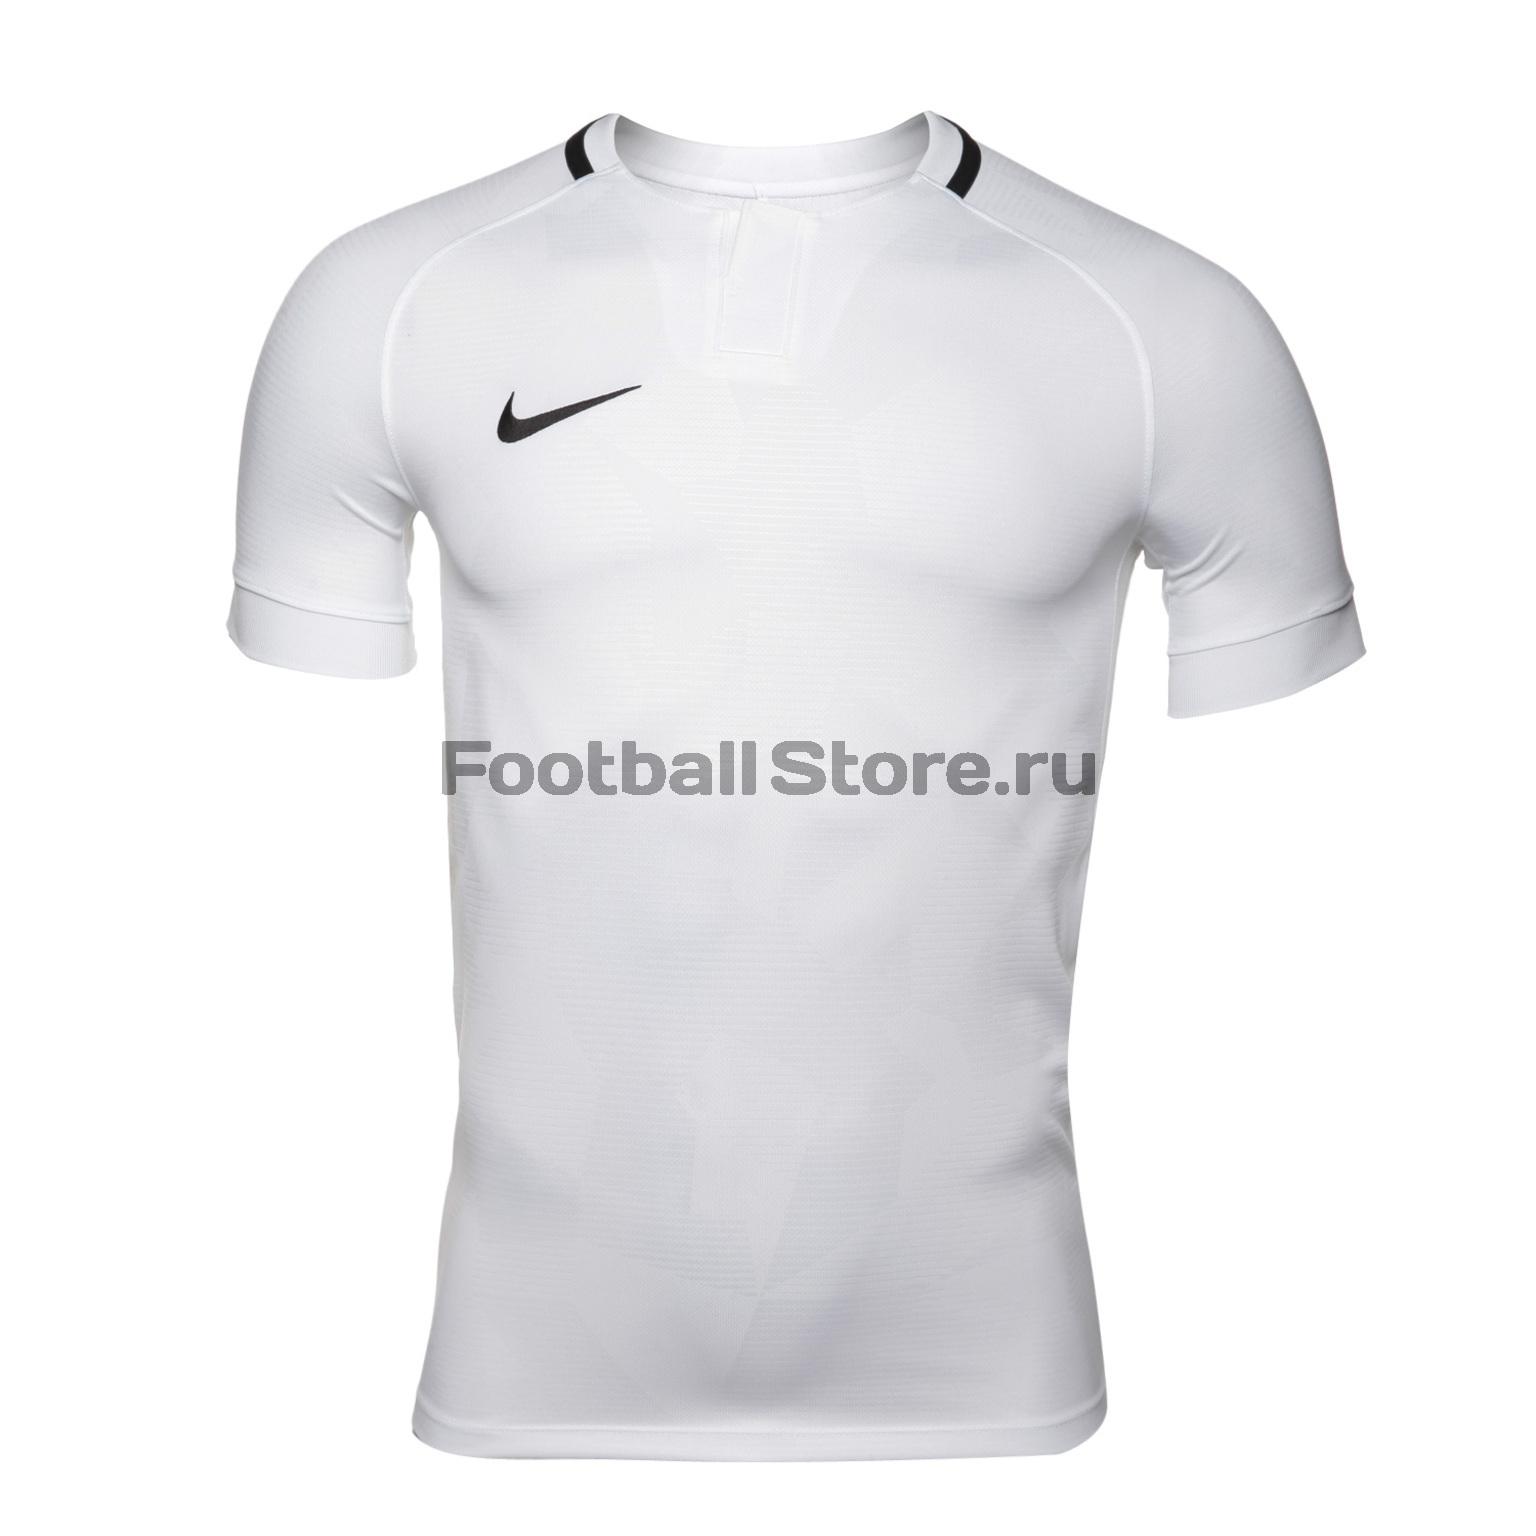 Футболка игровая Nike Dry Challenge II 893964-100 футболка игровая nike dry challenge ii 893964 100